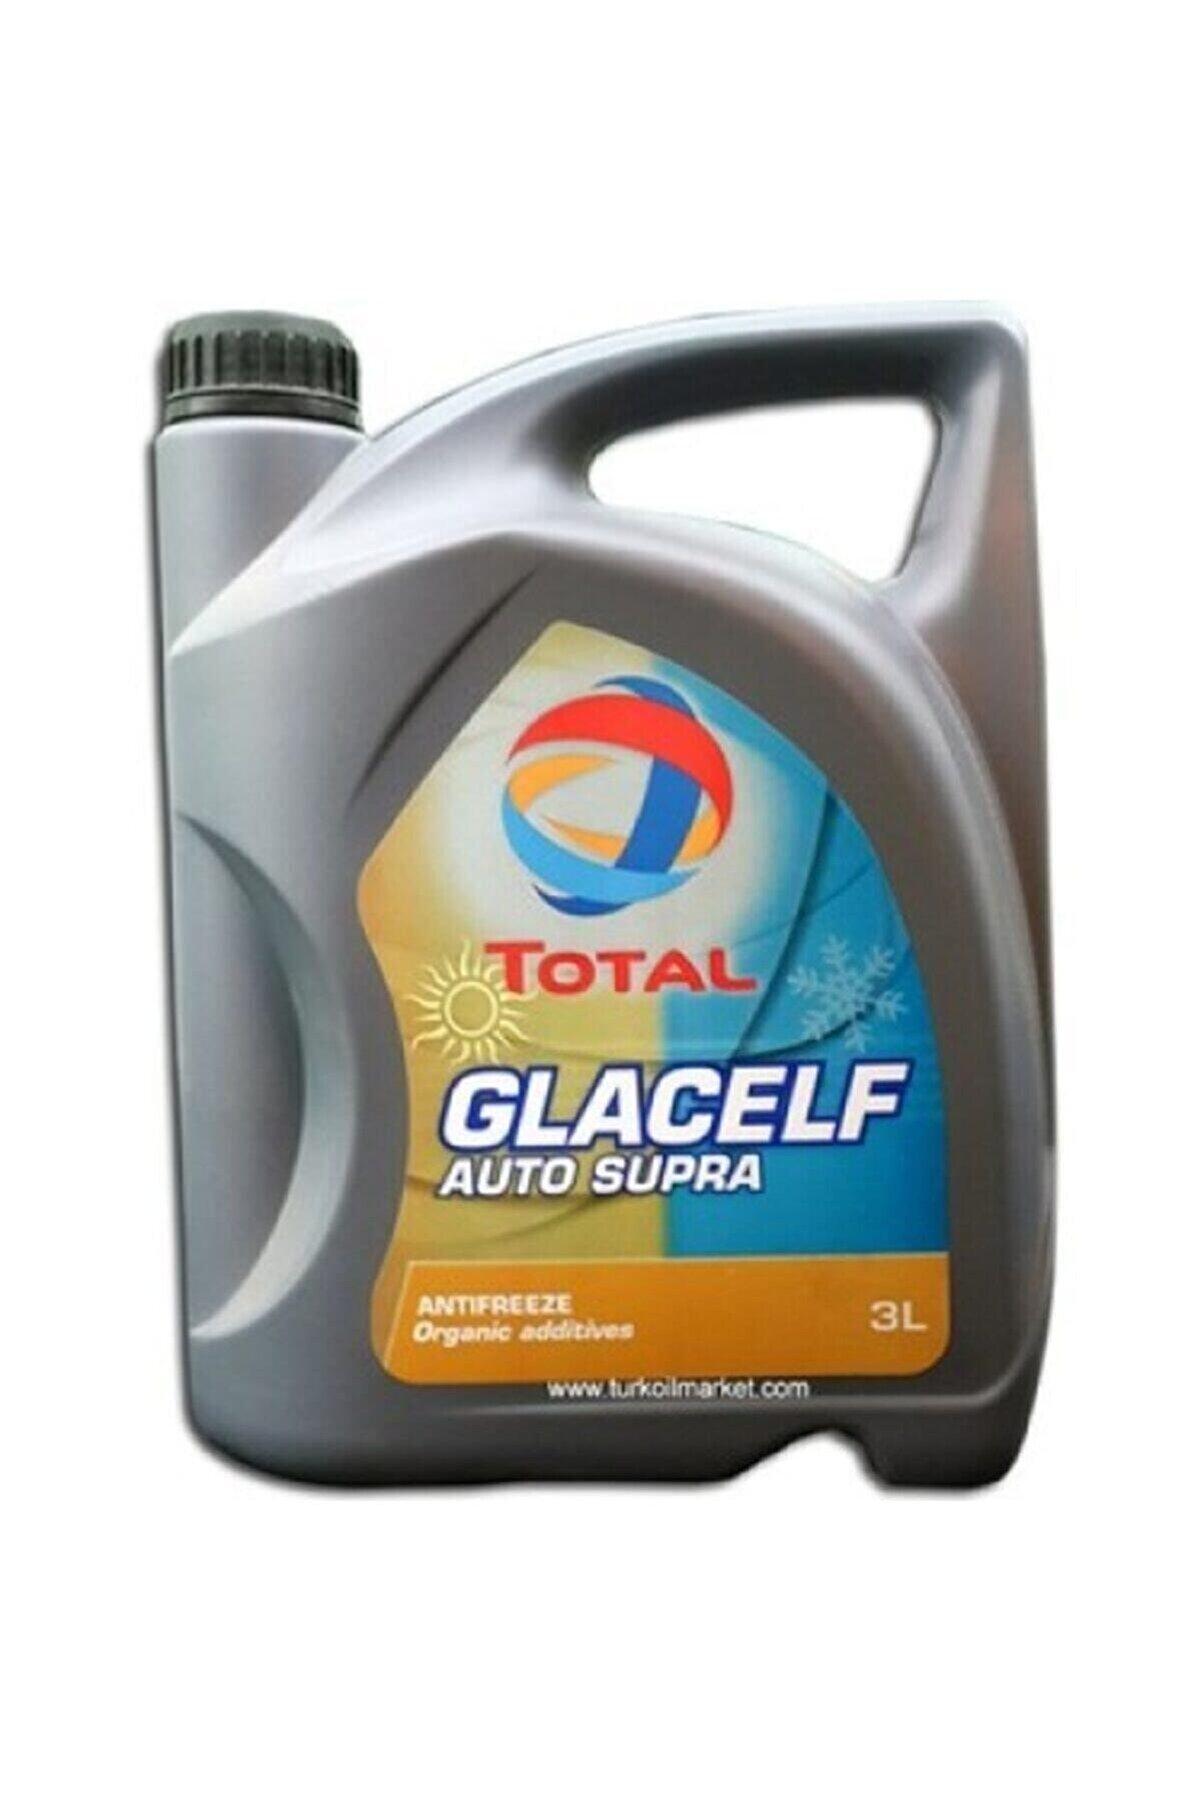 TOTAL Glacef Auto Supra Antifiriz 3 Lt